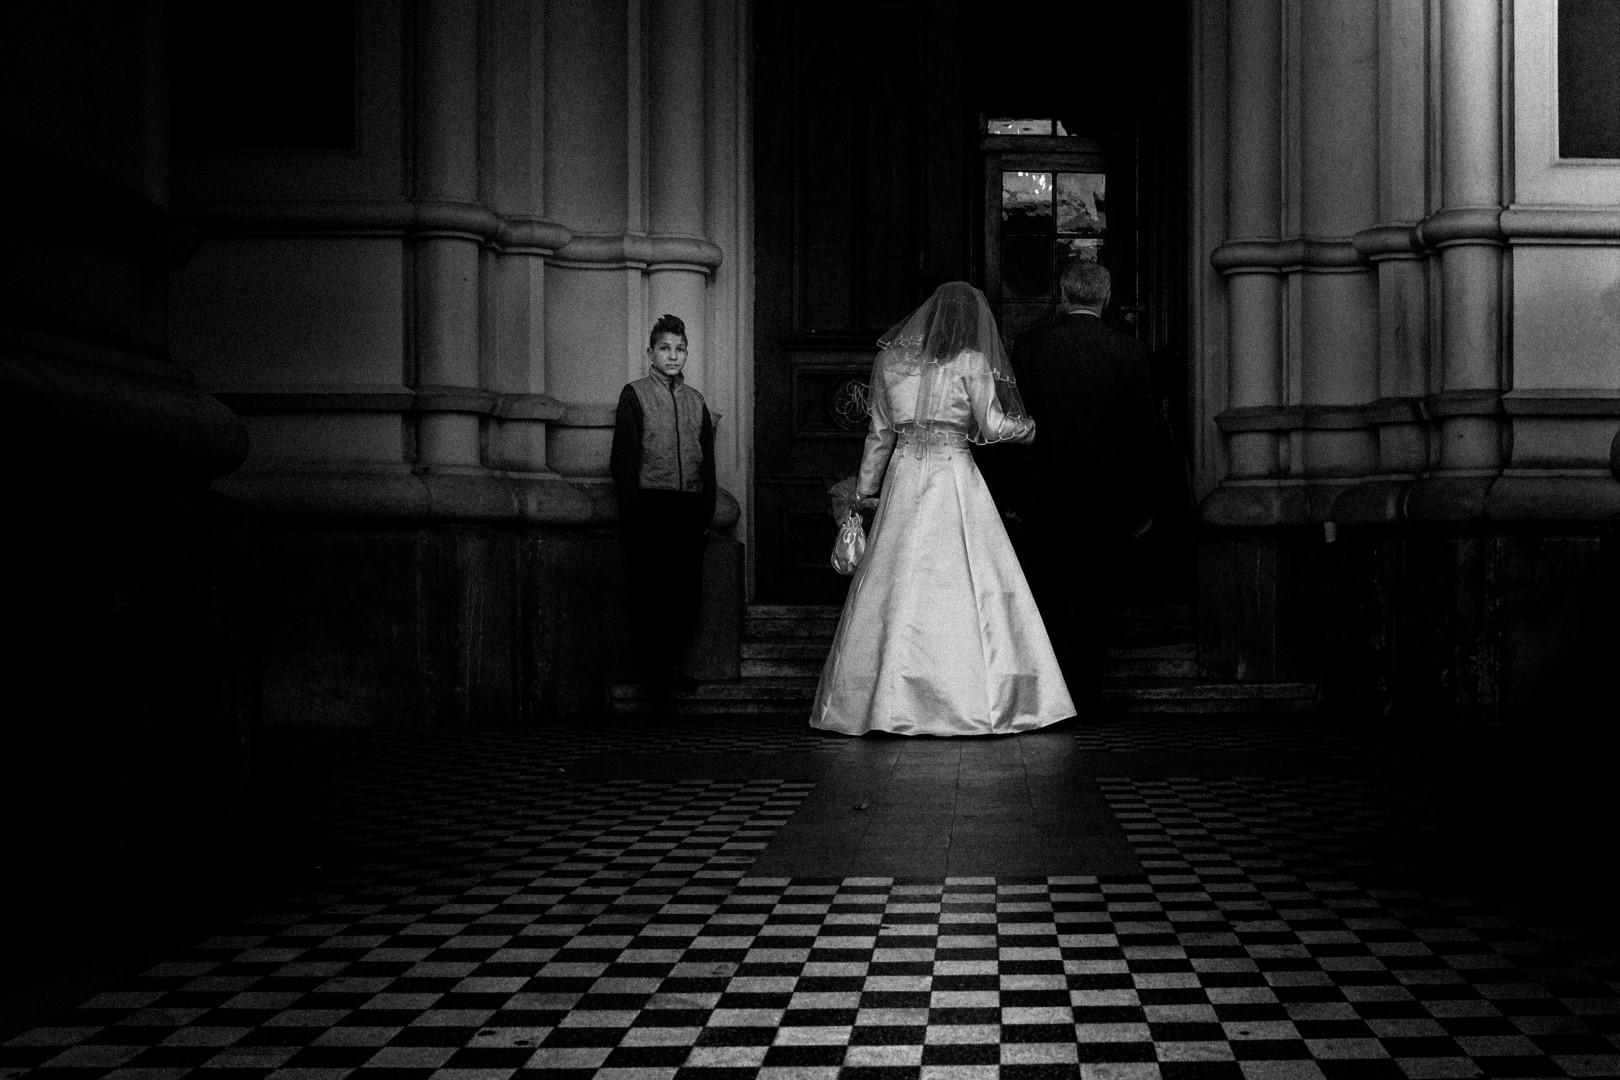 white-wedding_22580871599_o (Large).jpg